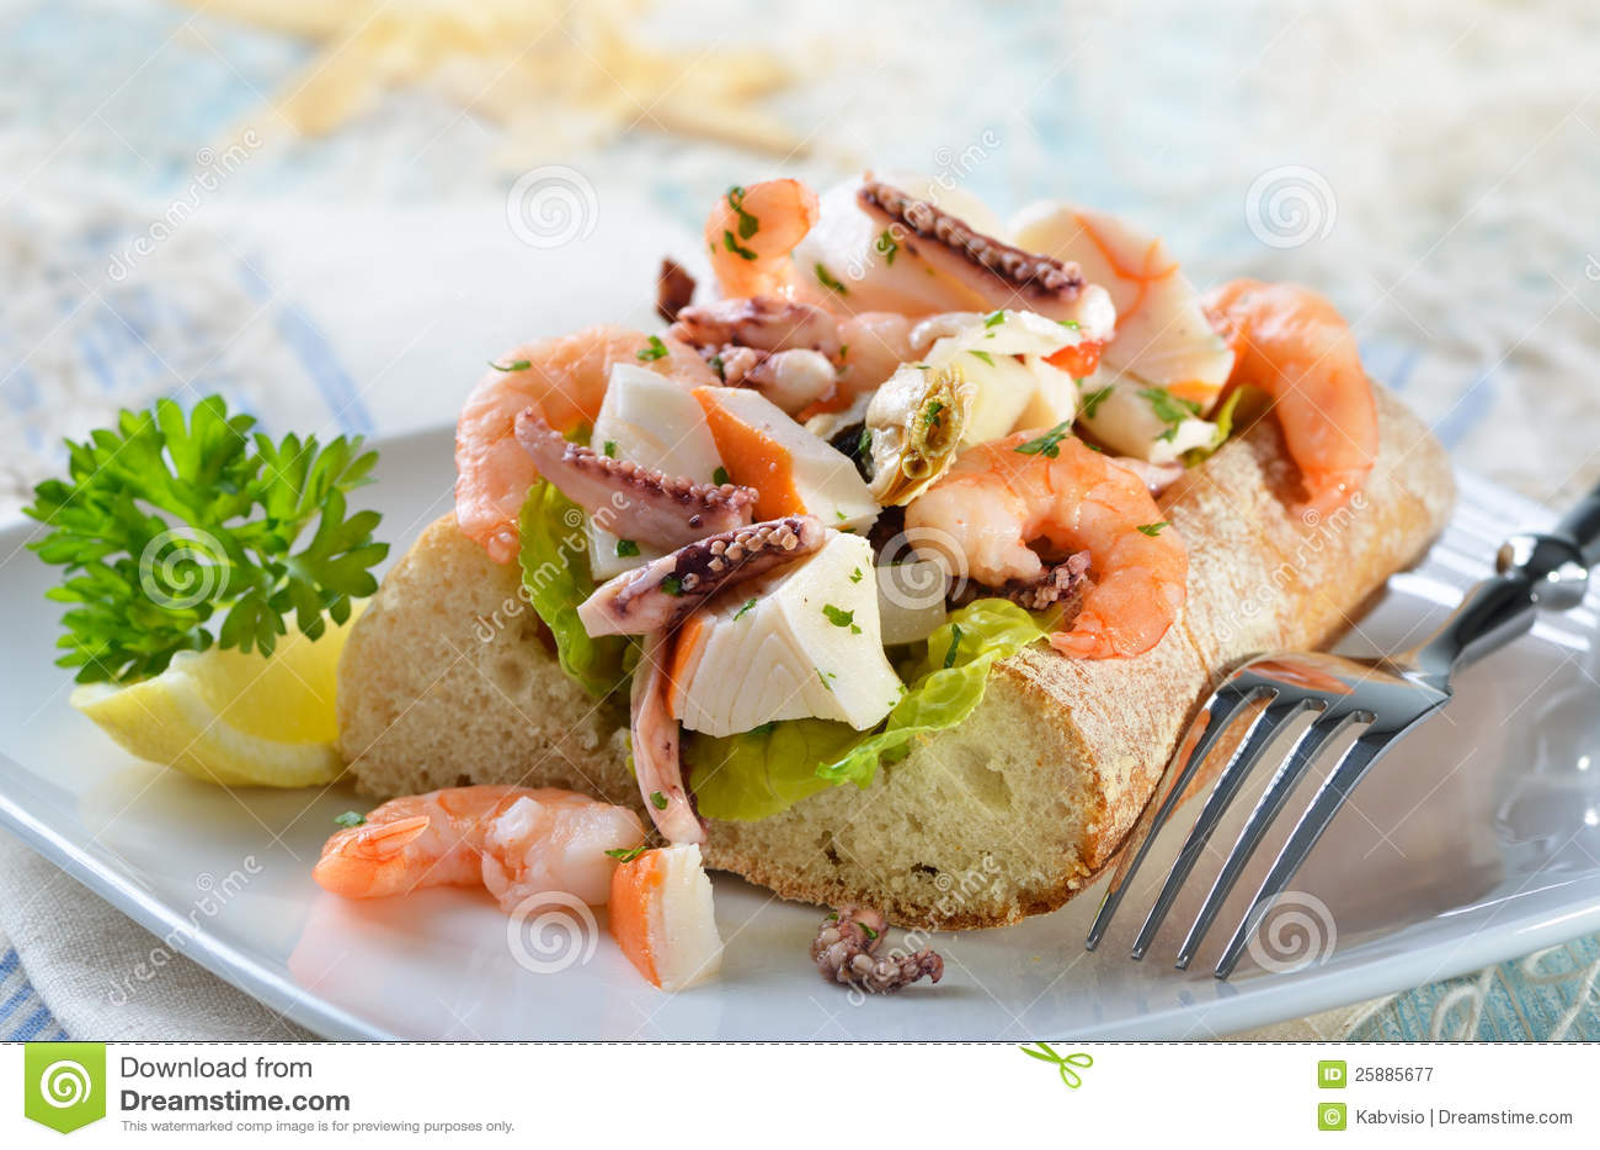 Seafood Salad On Ciabatta Bread Royalty Free Stock Photography - Image ...